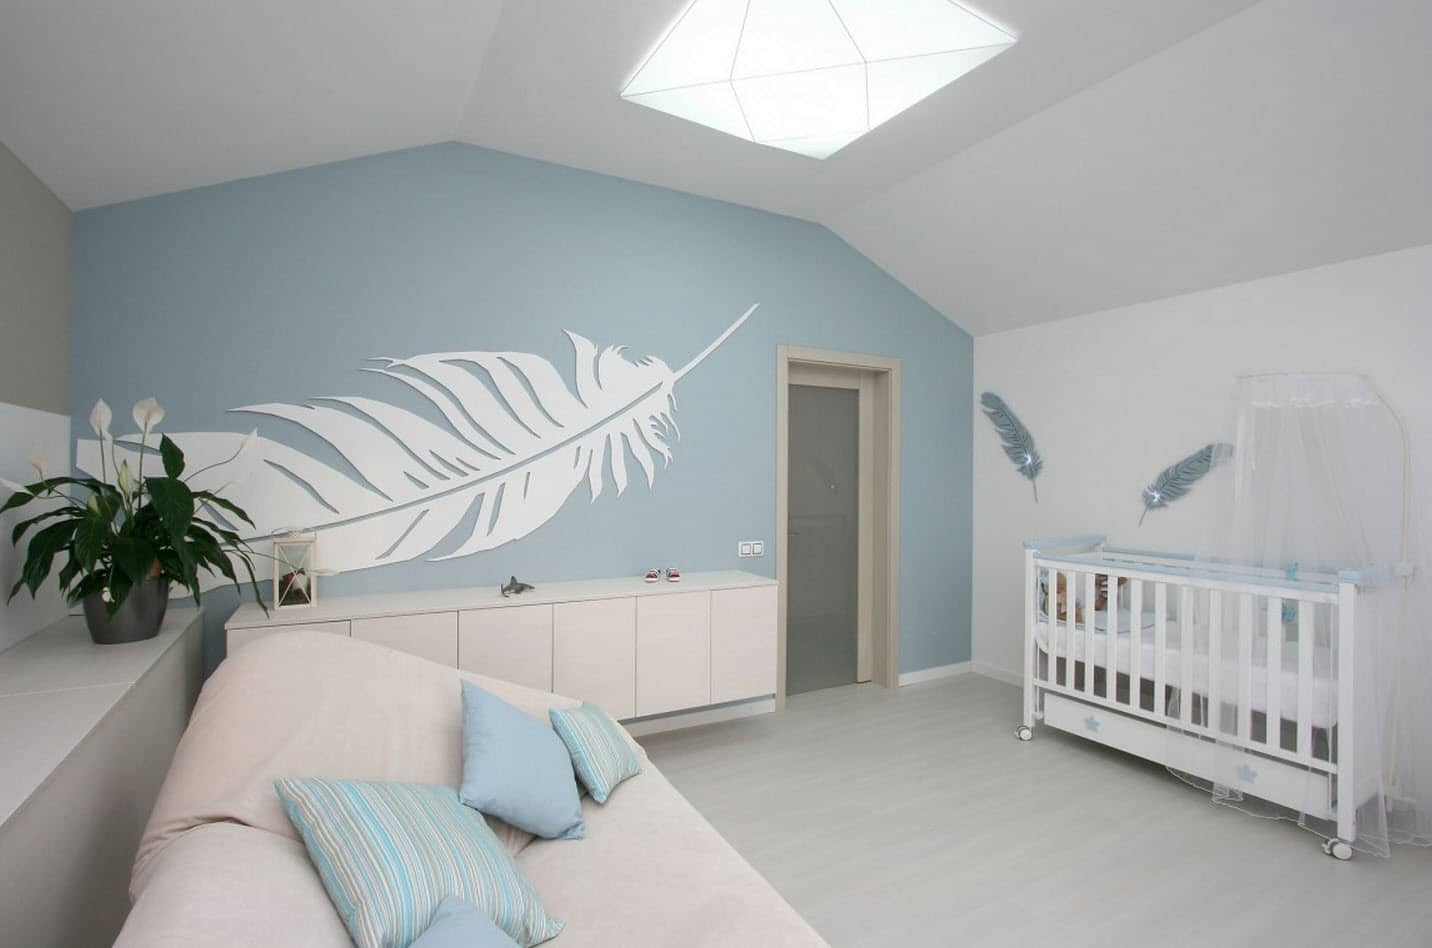 Dise o casa moderna dos plantas y planos construye hogar for Dormitorio ninos diseno